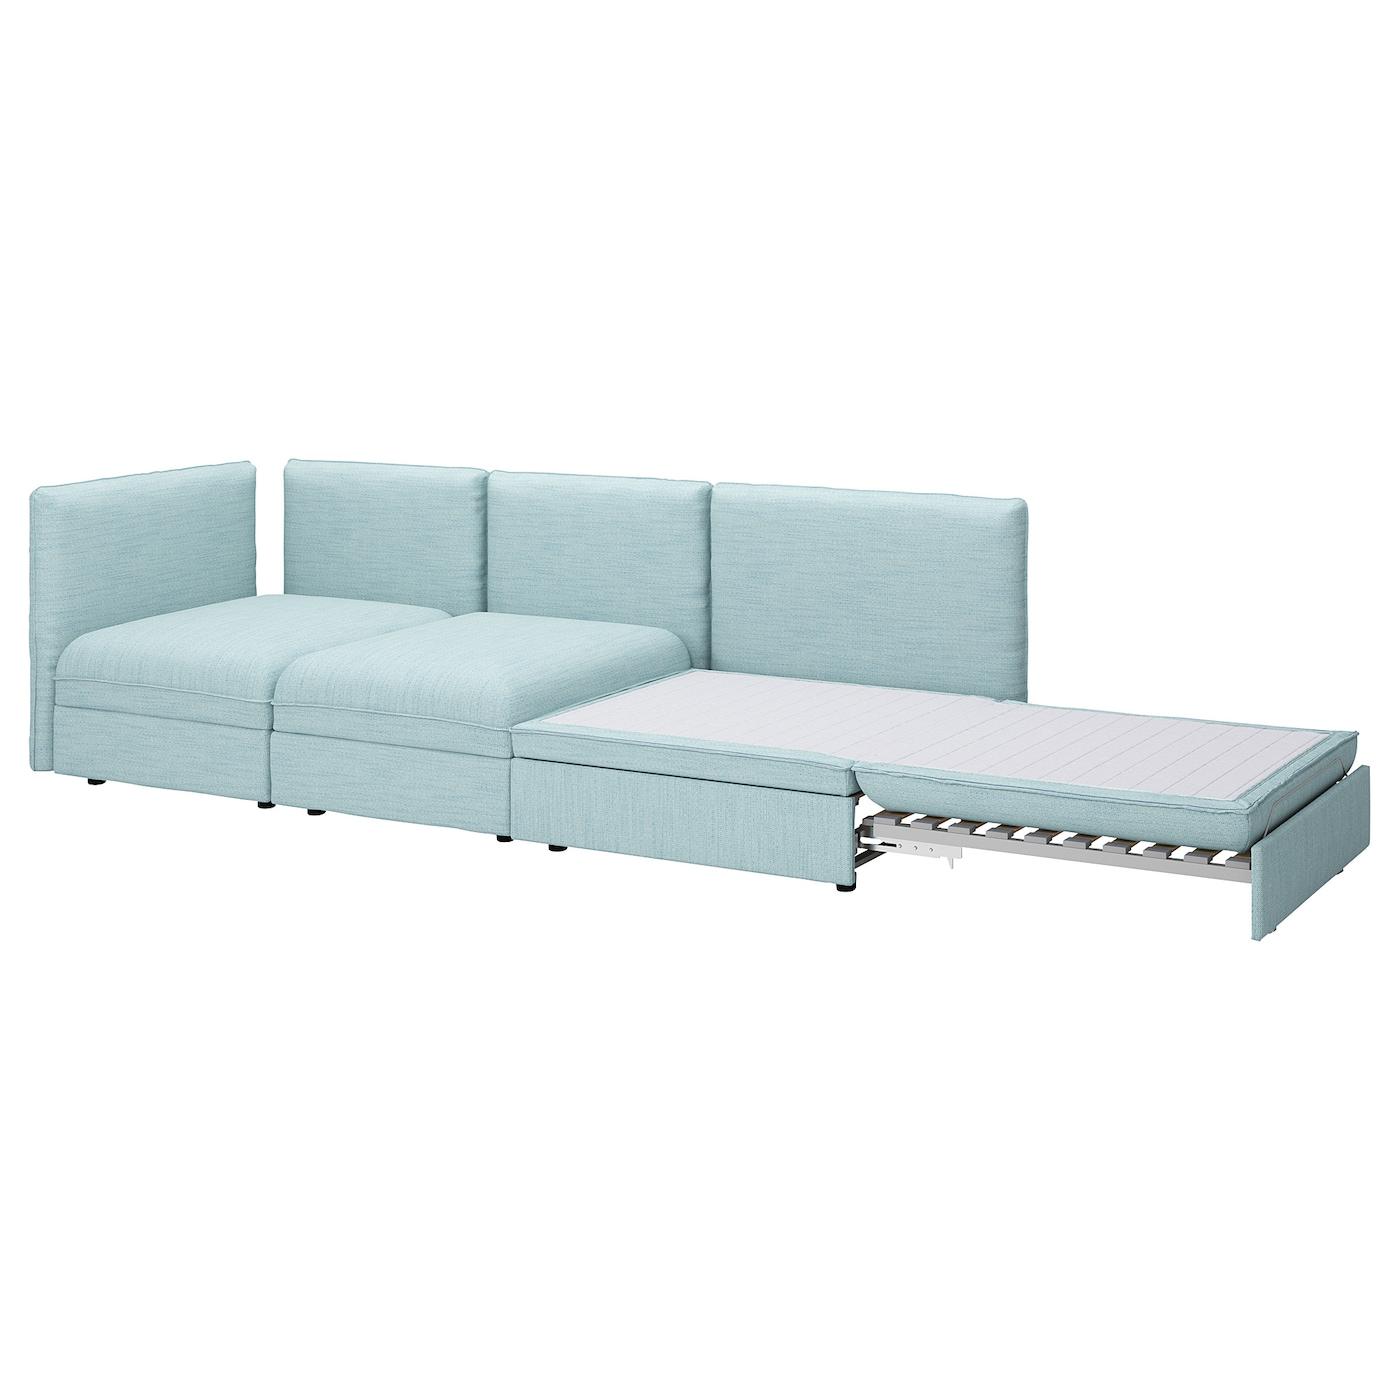 Vallentuna 3 Seat Modular Sleeper Sofa